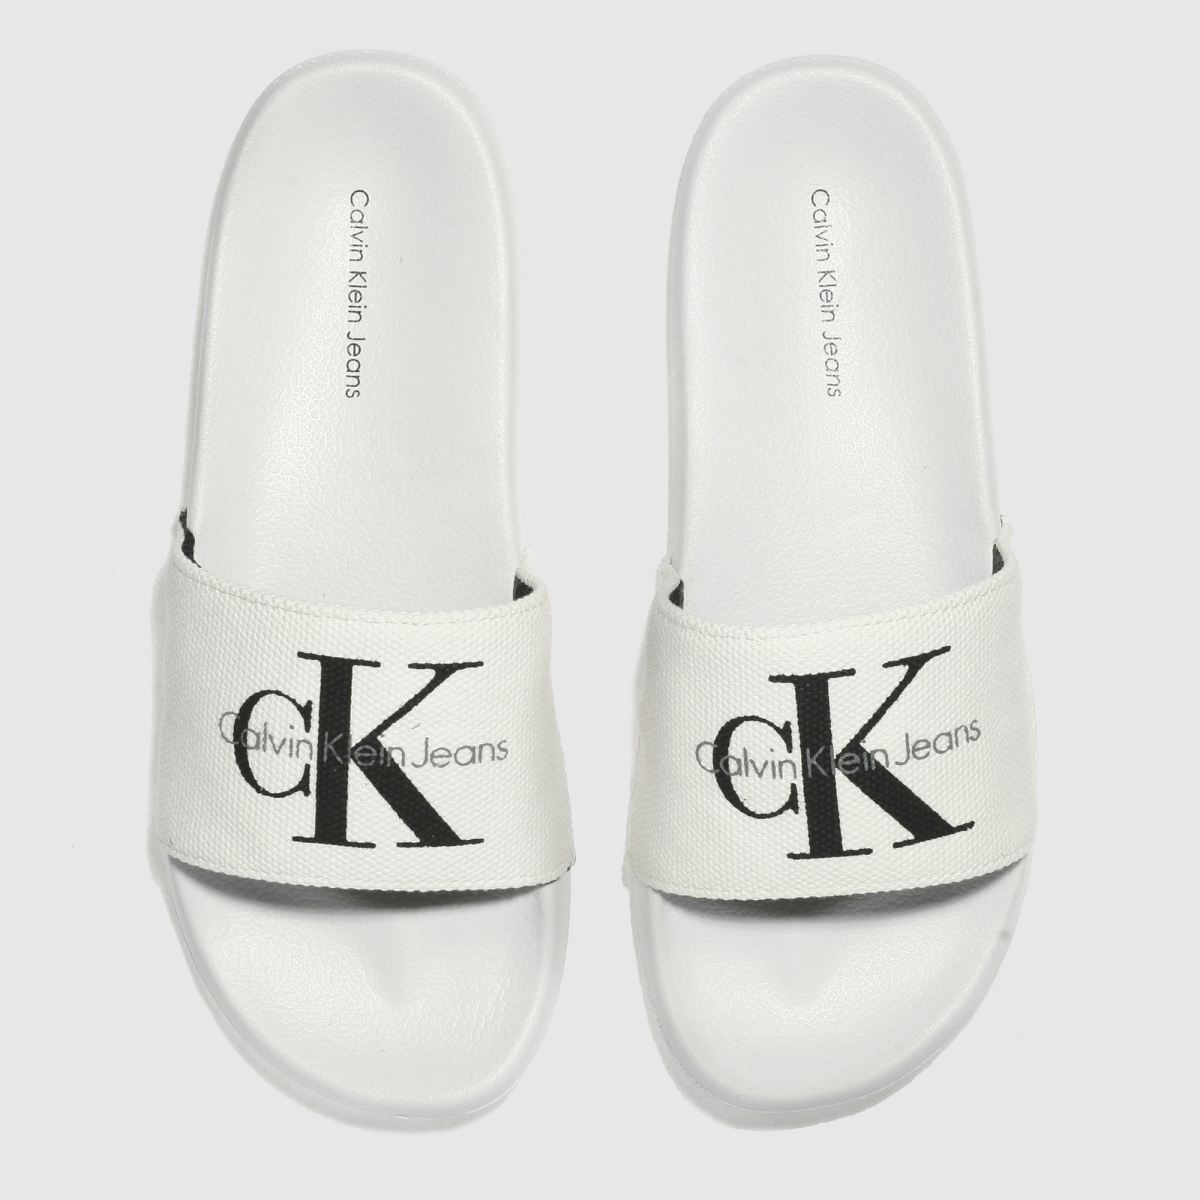 Calvin Klein White & Black Jeans Chantal Heavy Canvas Sandals